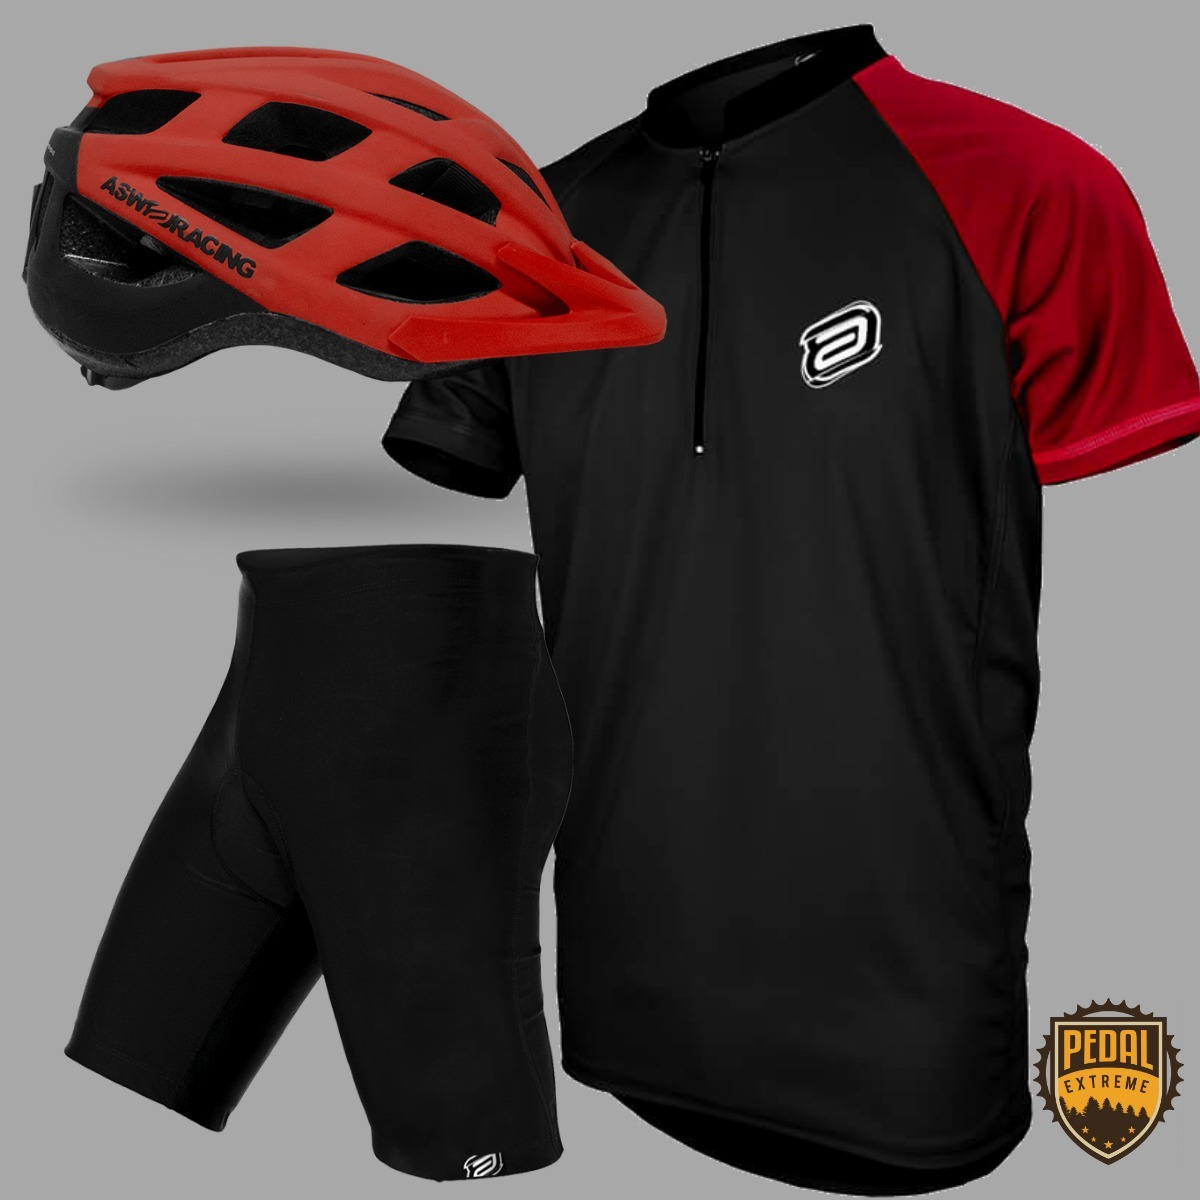 2dc3e315859b8 bermuda ciclismo + camisa + capacete black friday bicicleta. Carregando  zoom.